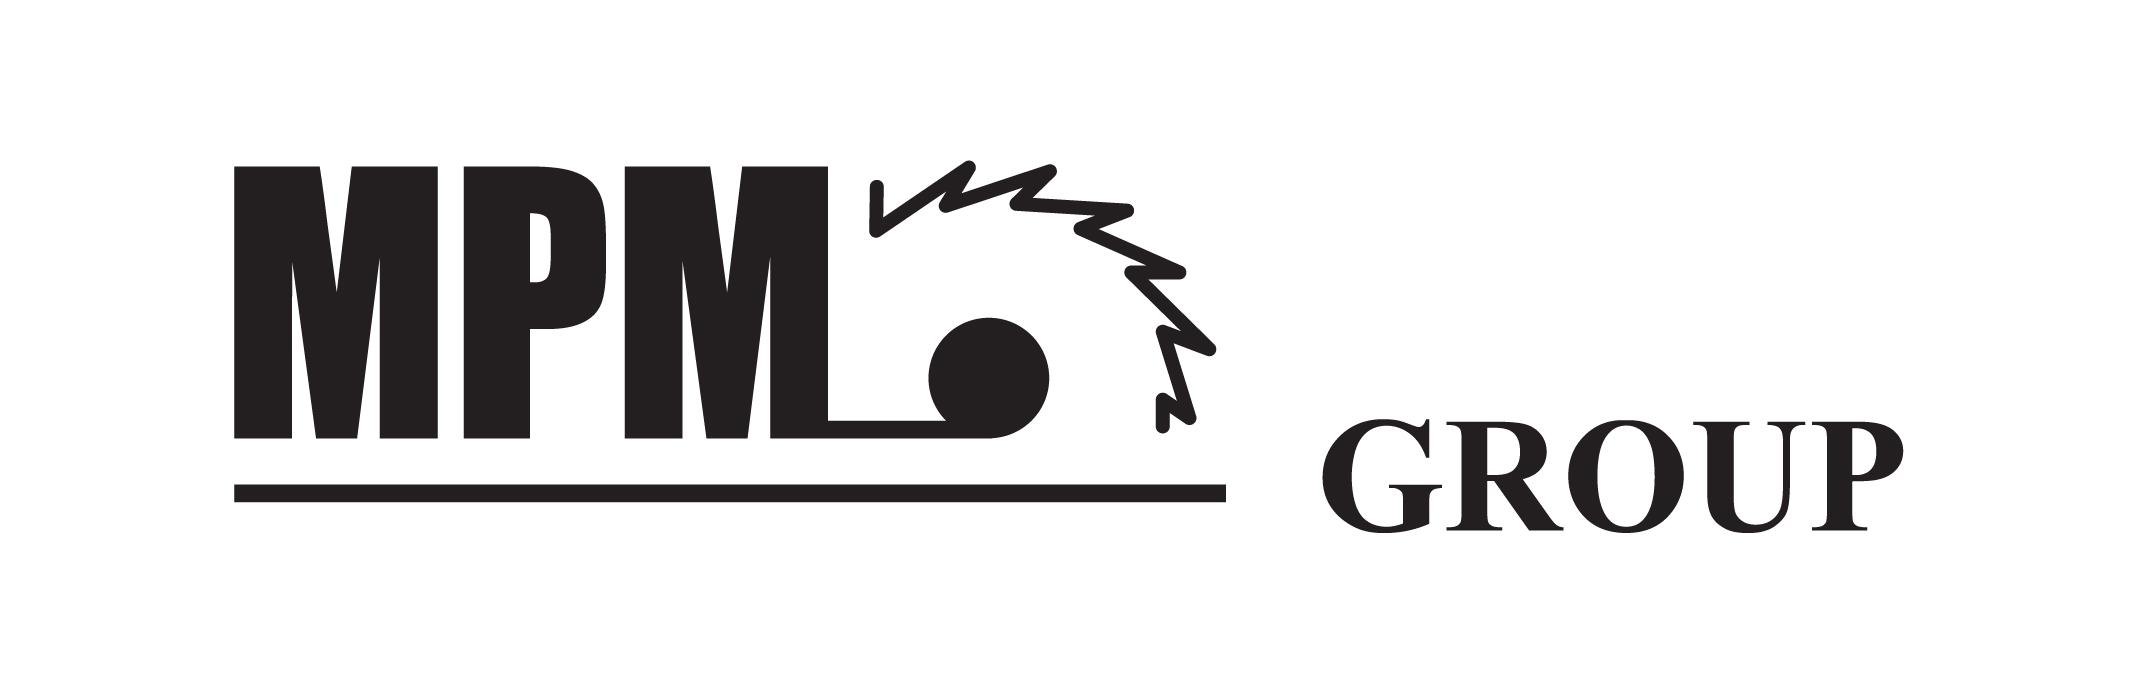 MPM_logo-01